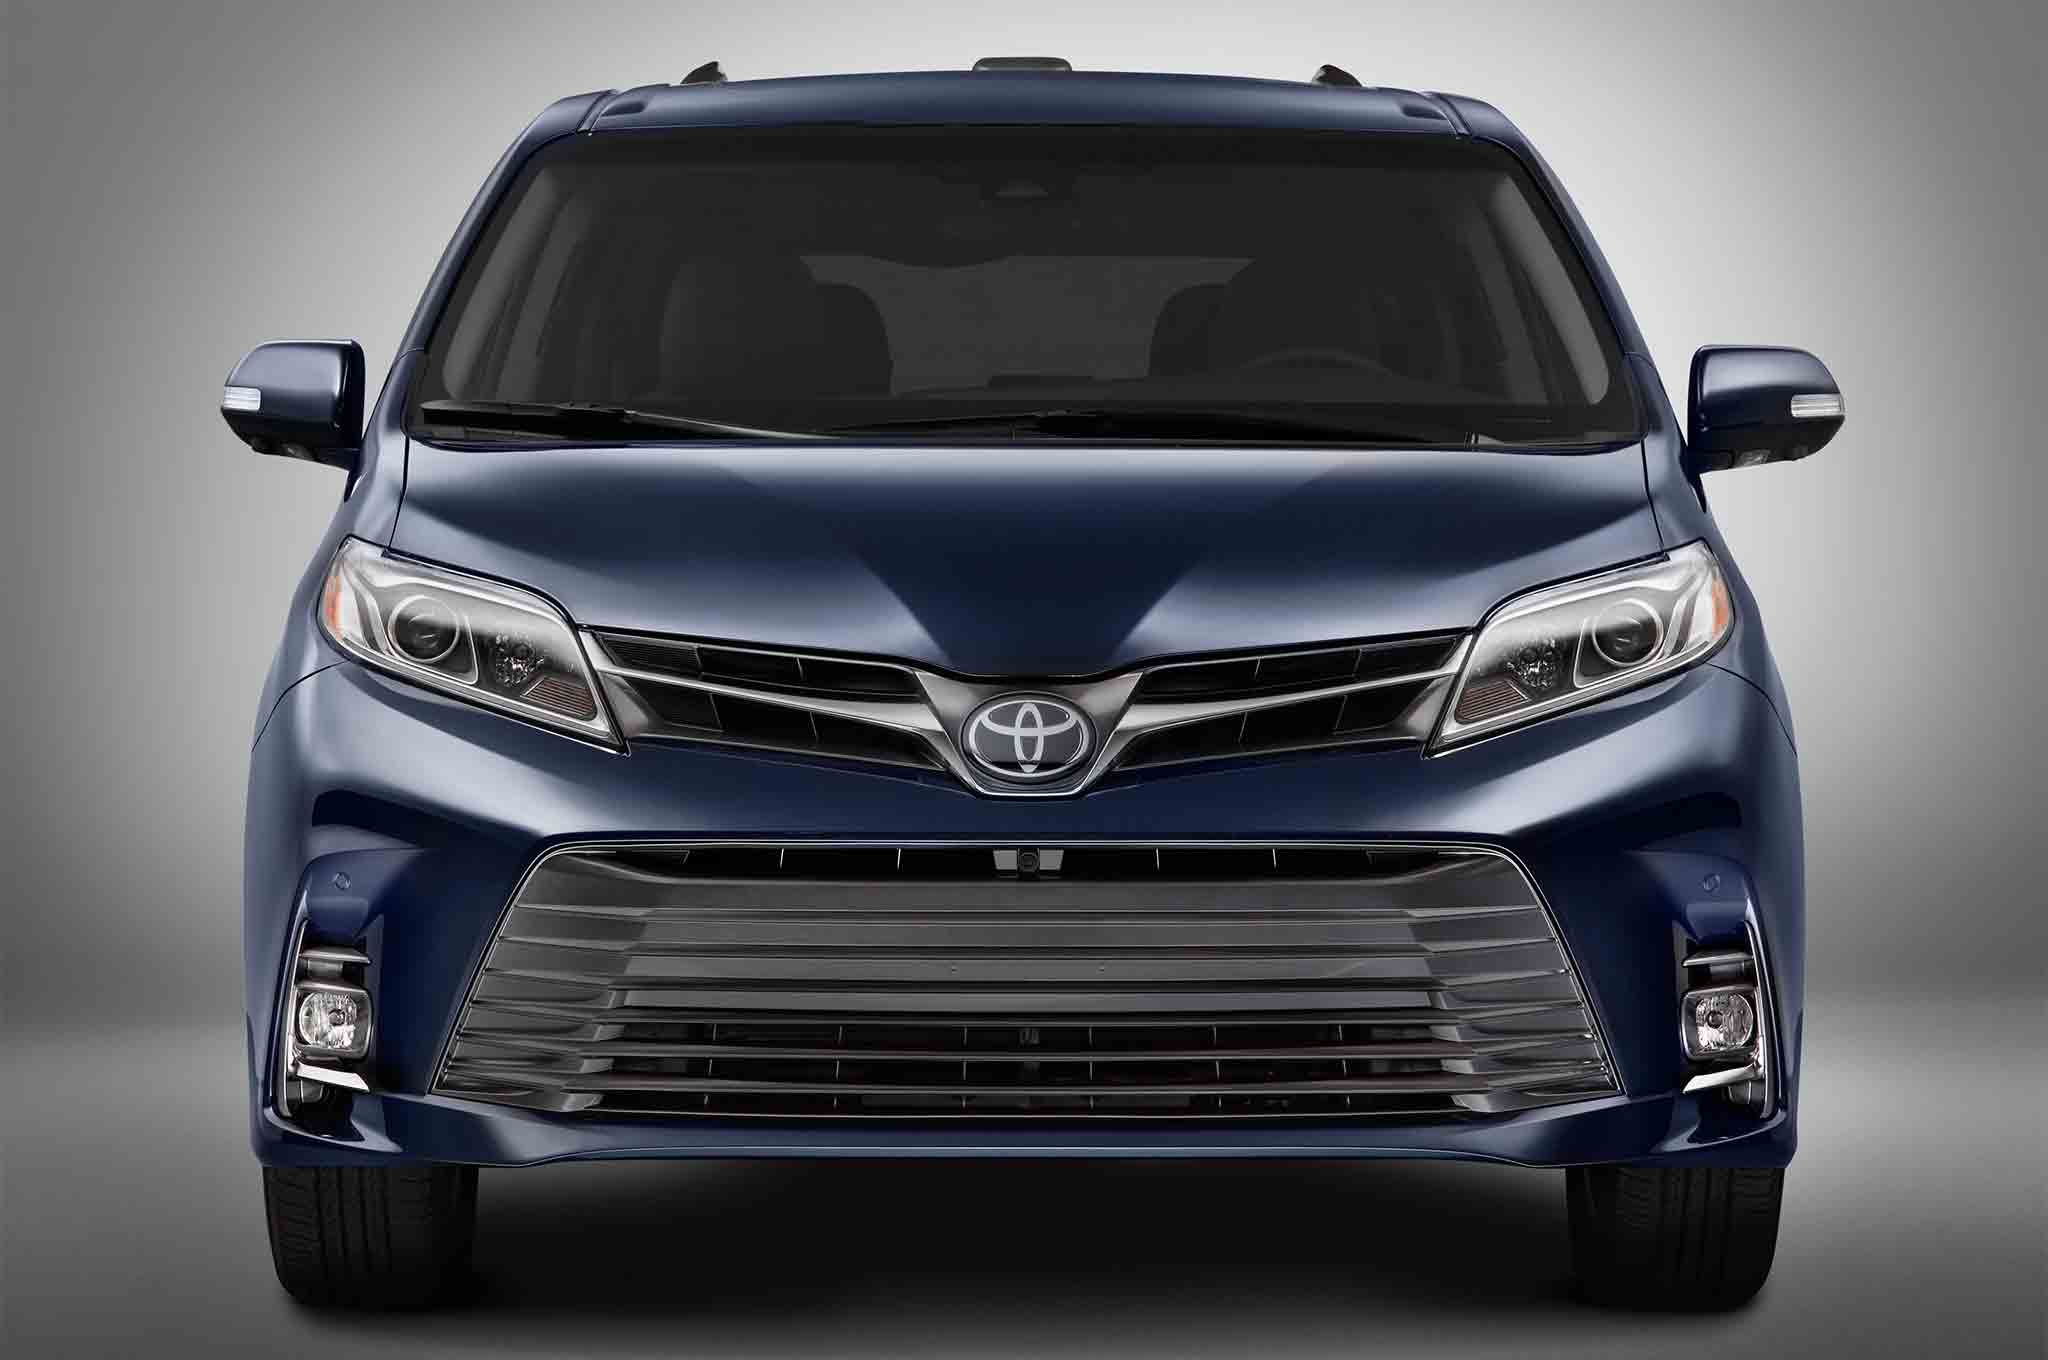 Toyota Sienna 2018 Hybrid >> 2018 Toyota Sienna Quick Take Review